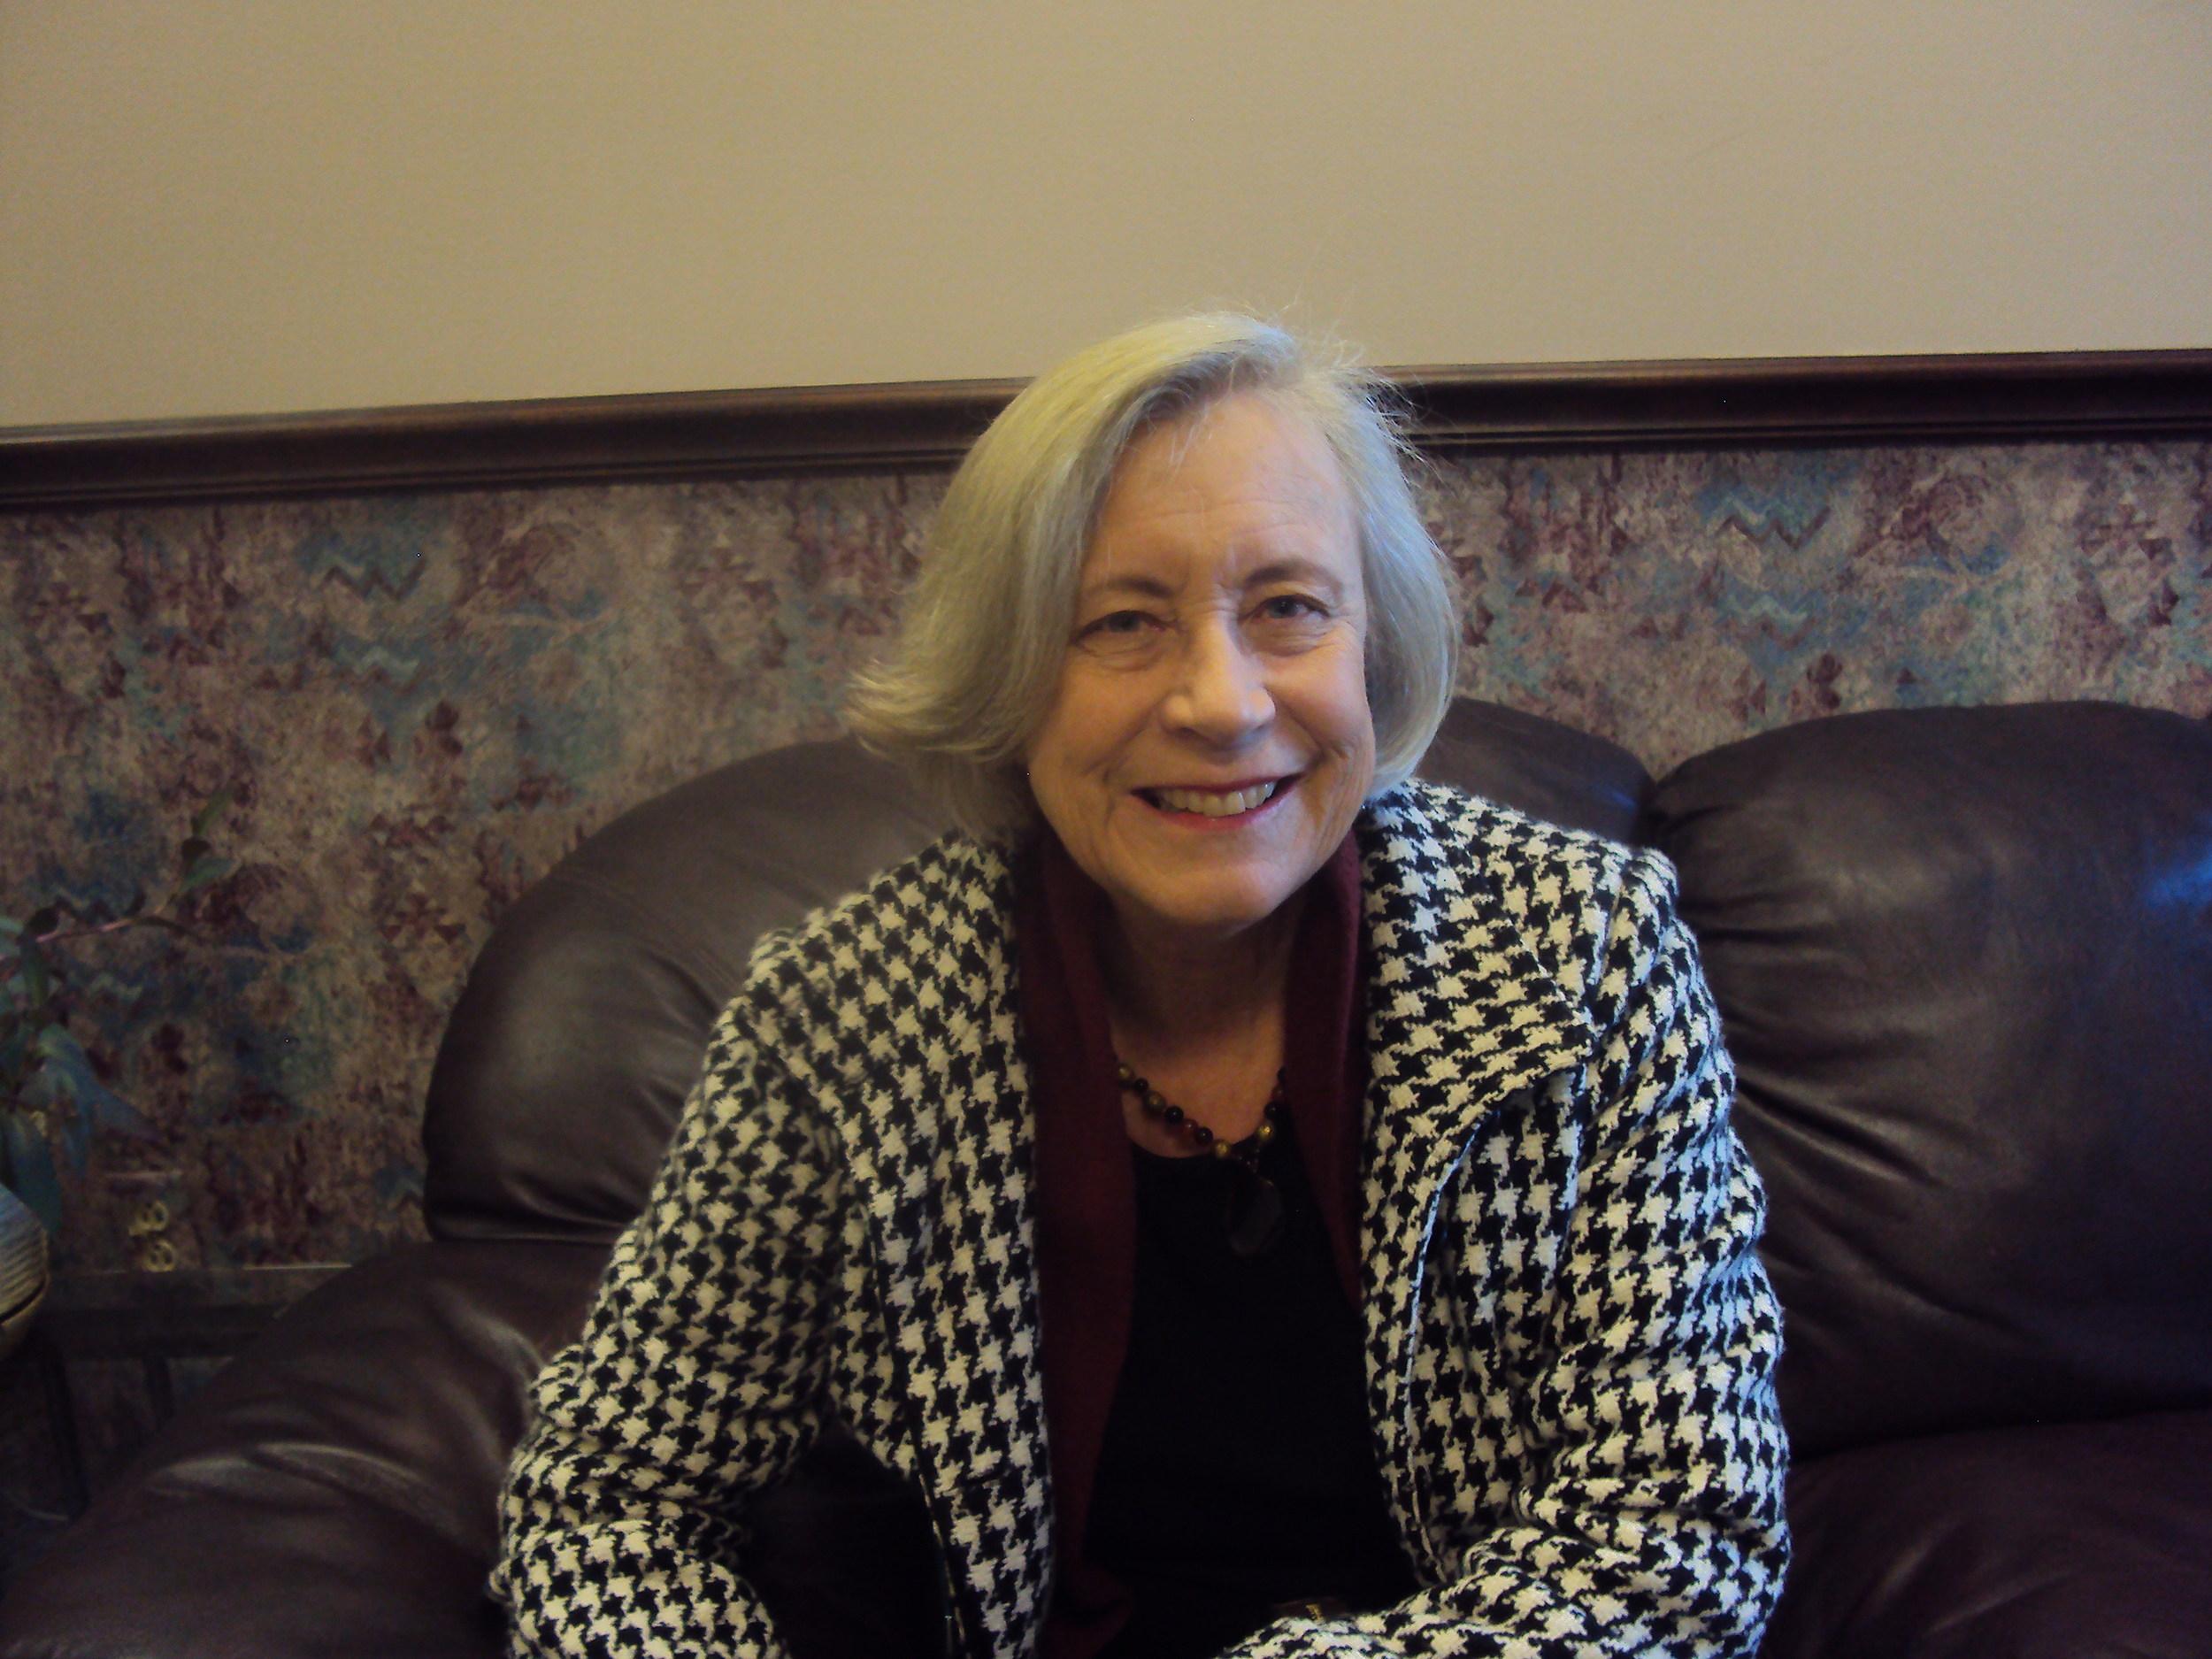 Kathy Whyte/ WNBF News